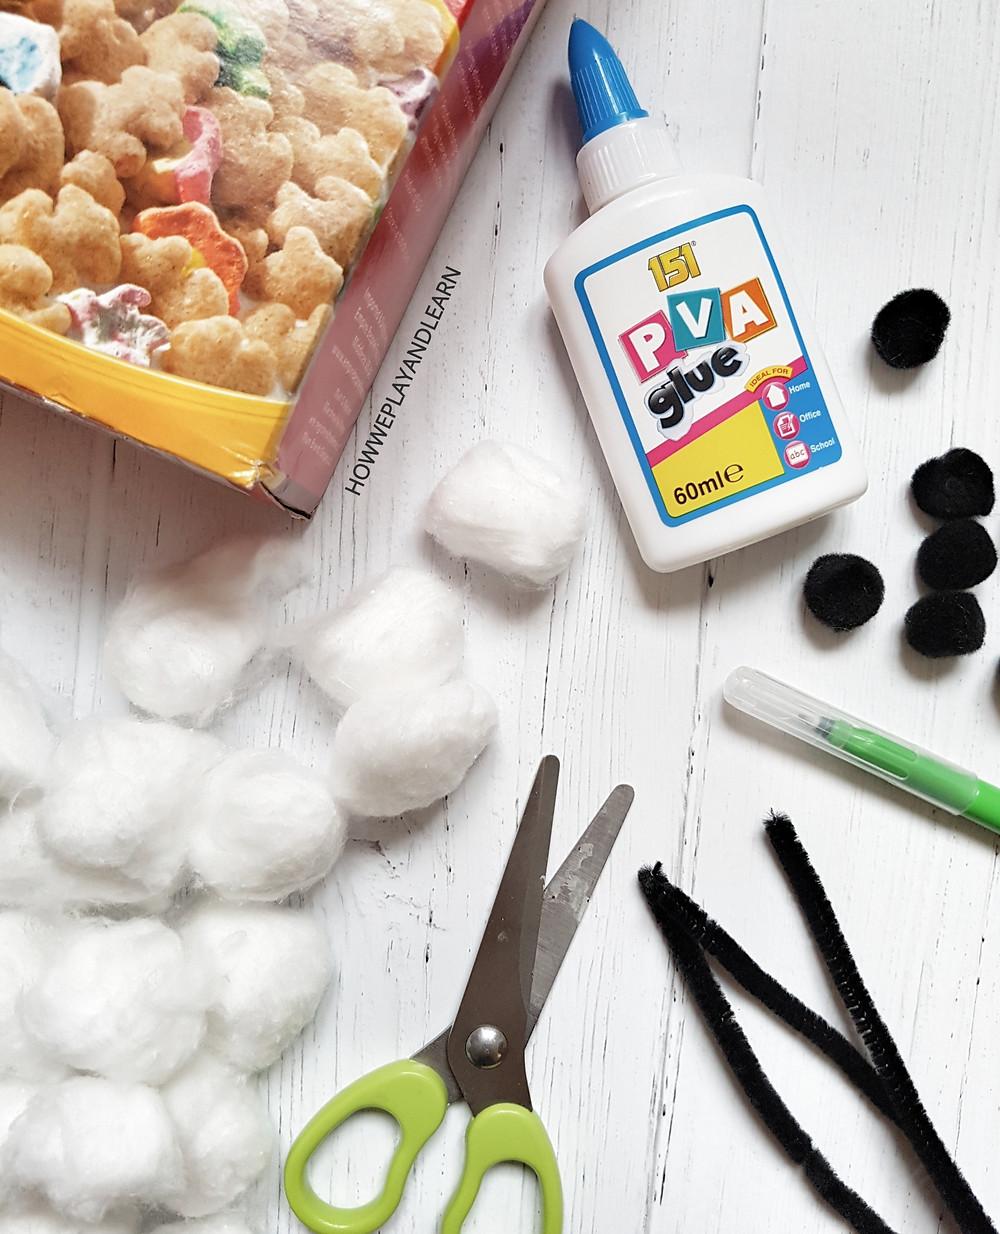 puffy ghost halloween craft supplies